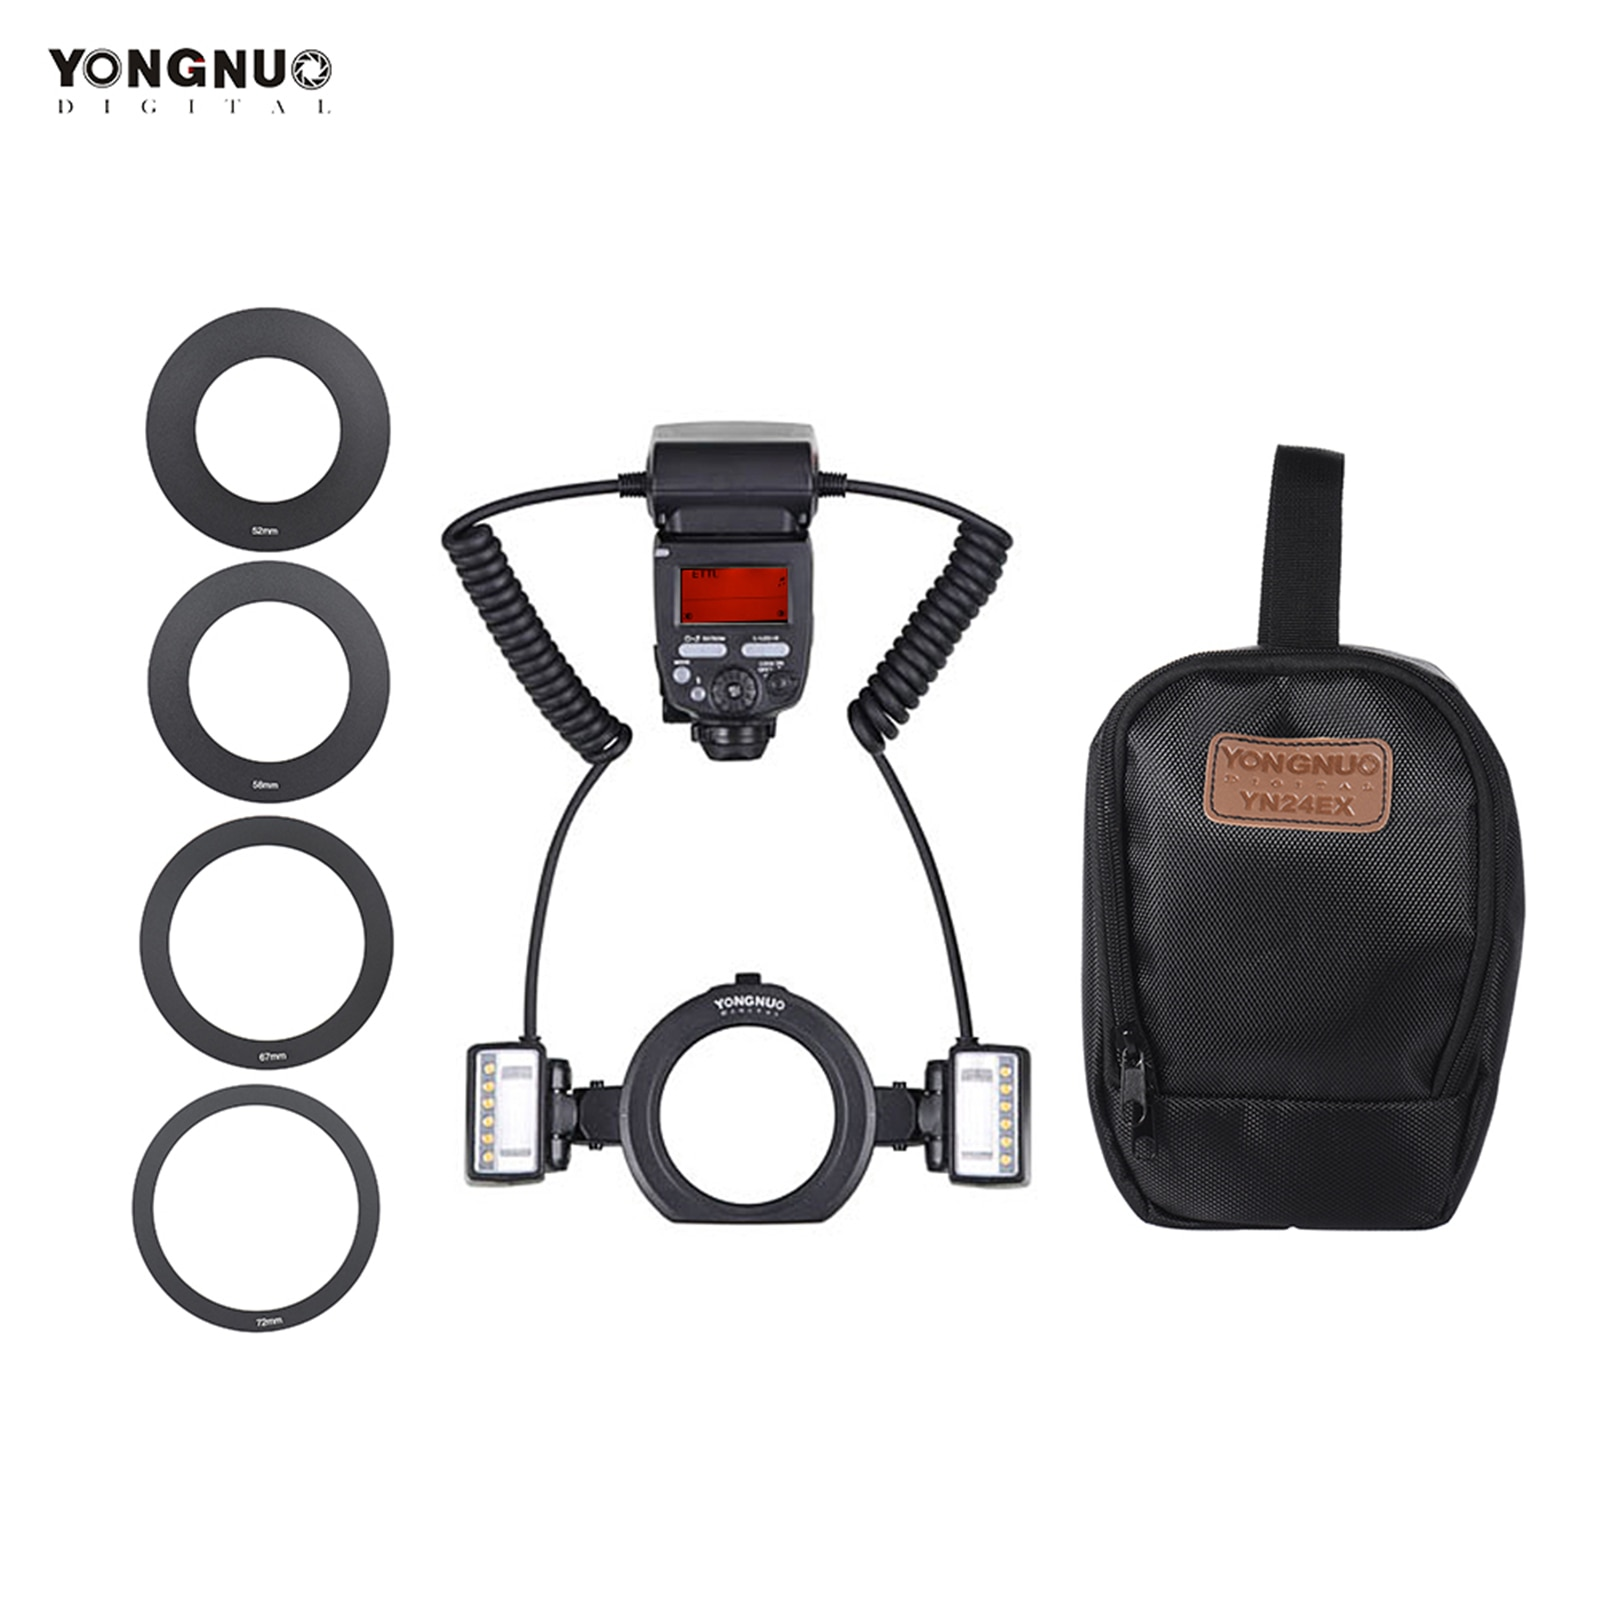 YONGNUO YN24EX E-TTL ماكرو فلاش Speedlite 5600K لكانون EOS 1Dx 5D3 6D 7D 70D 80D كاميرات Speedlite